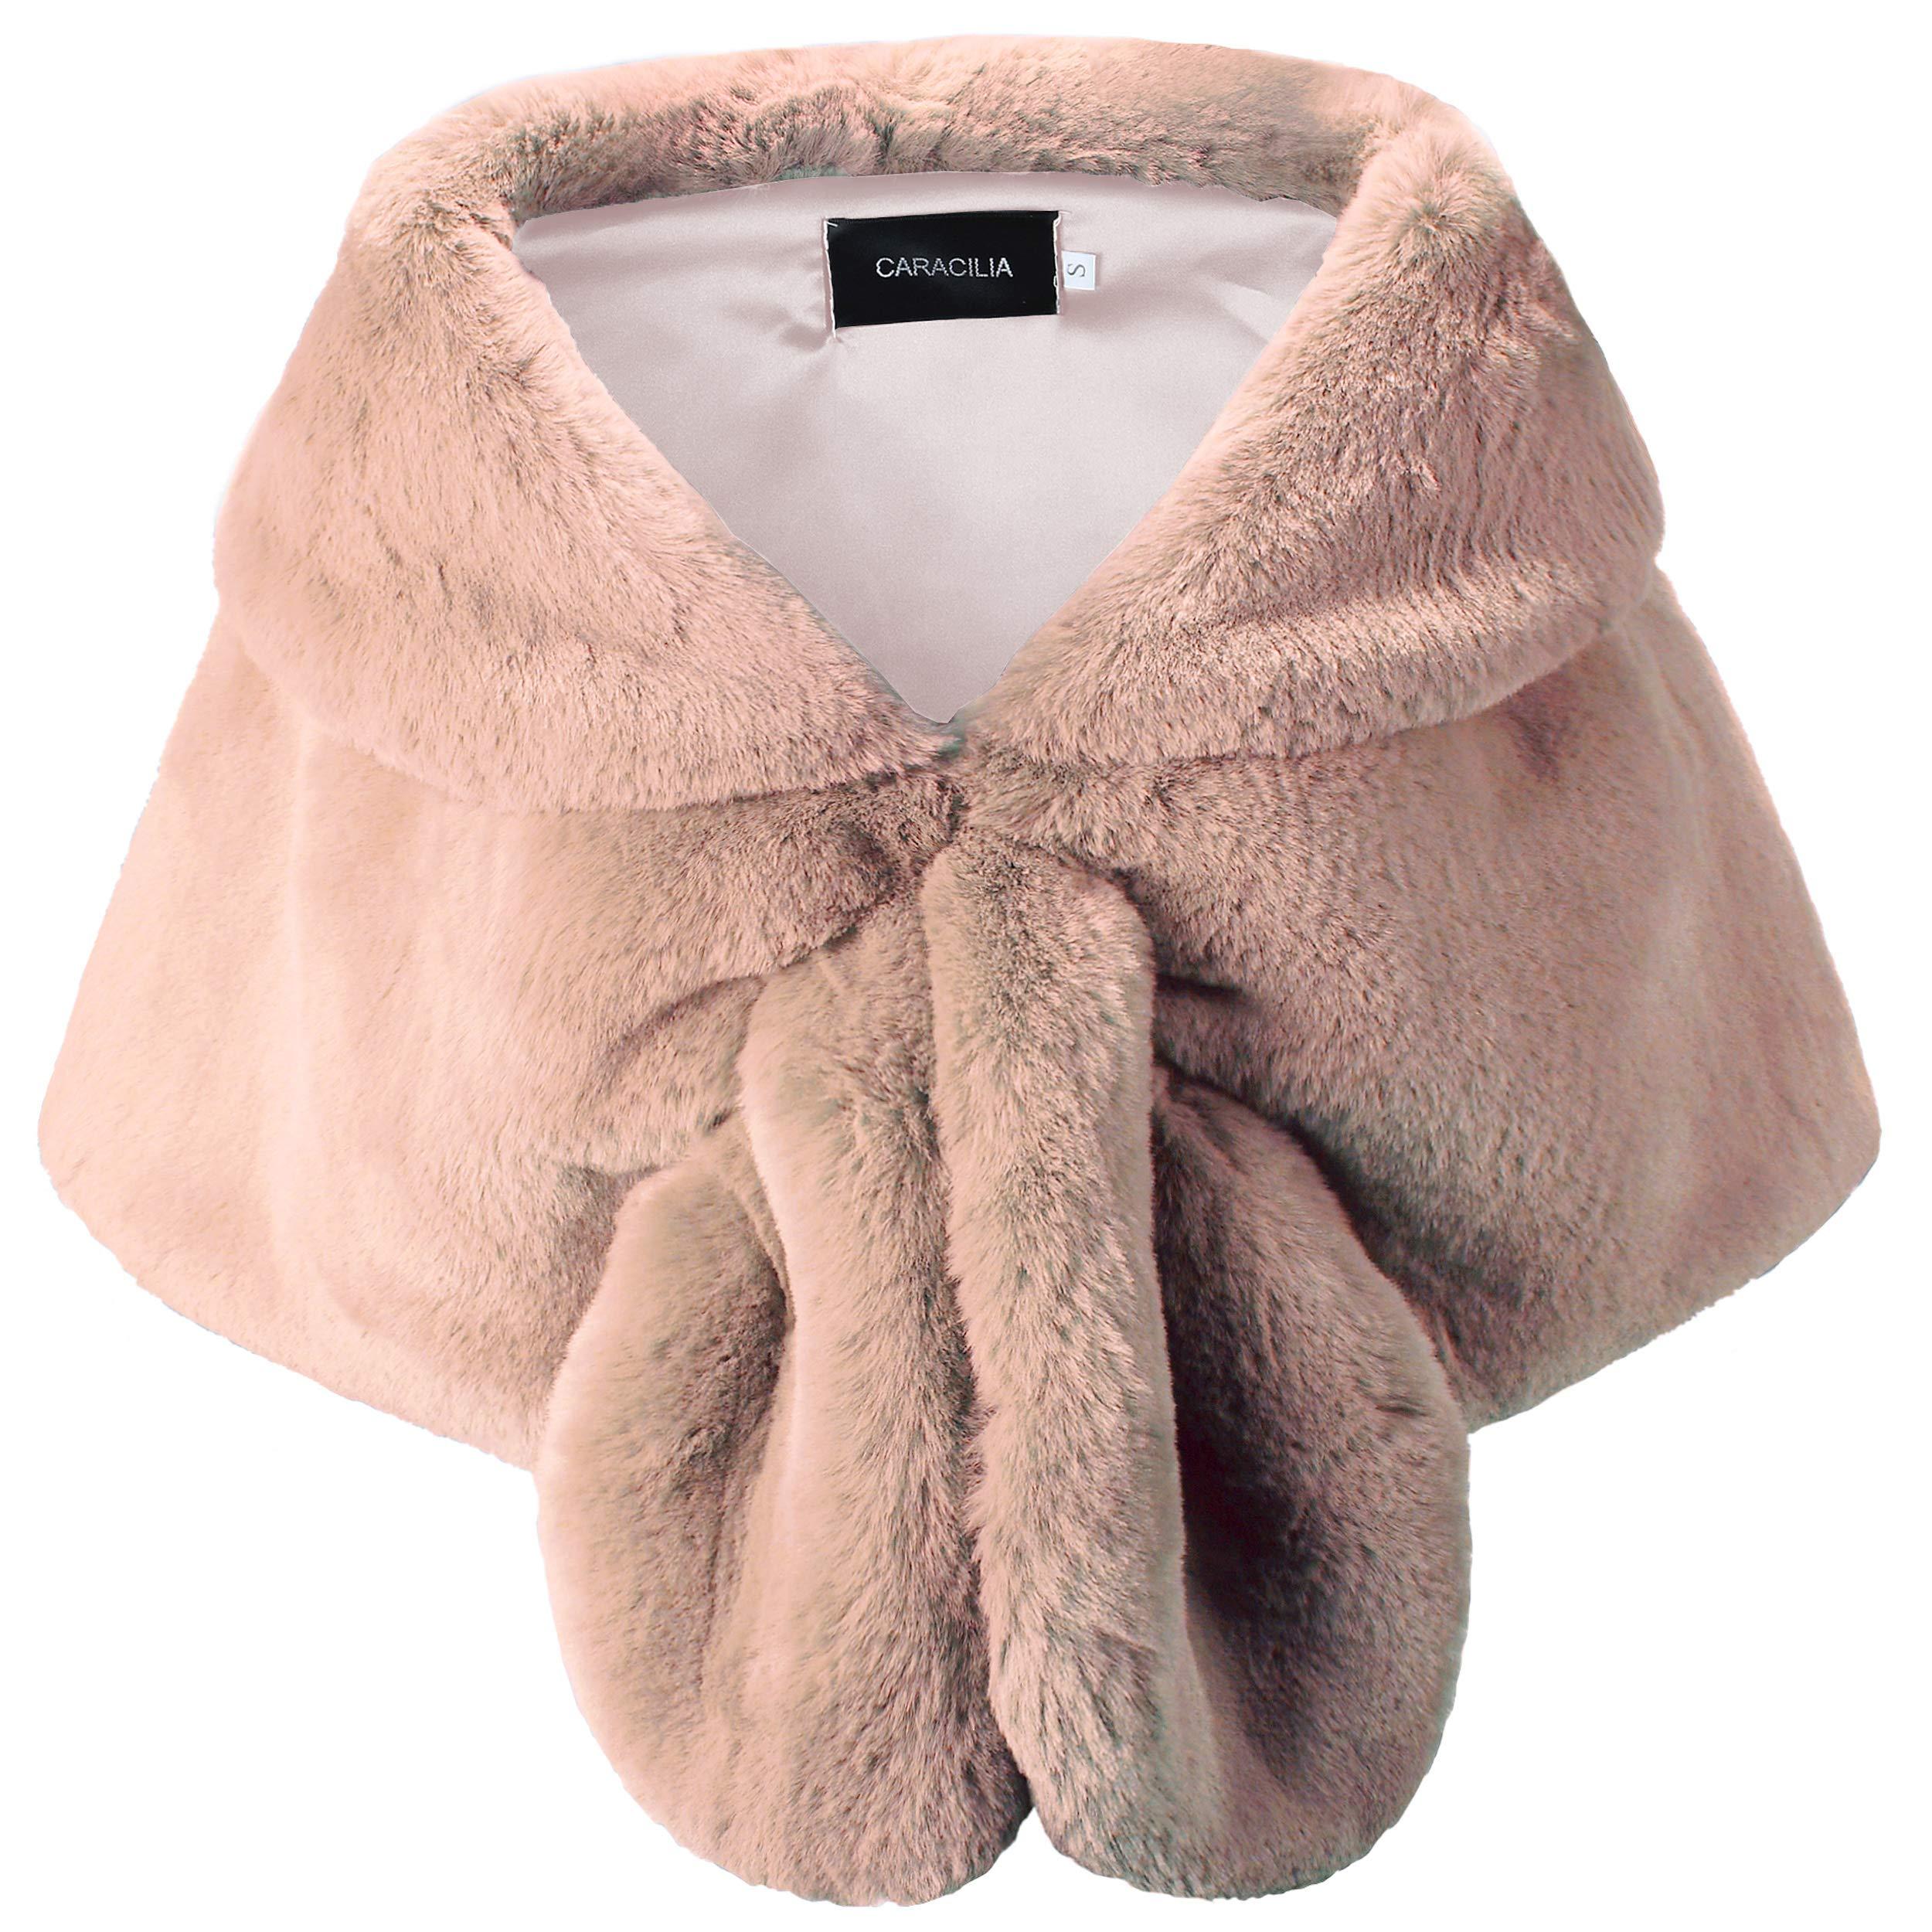 Caracilia Faux Fur Shawl Wrap Stole Shrug Winter Bridal Cover Up oufen2 L CA95